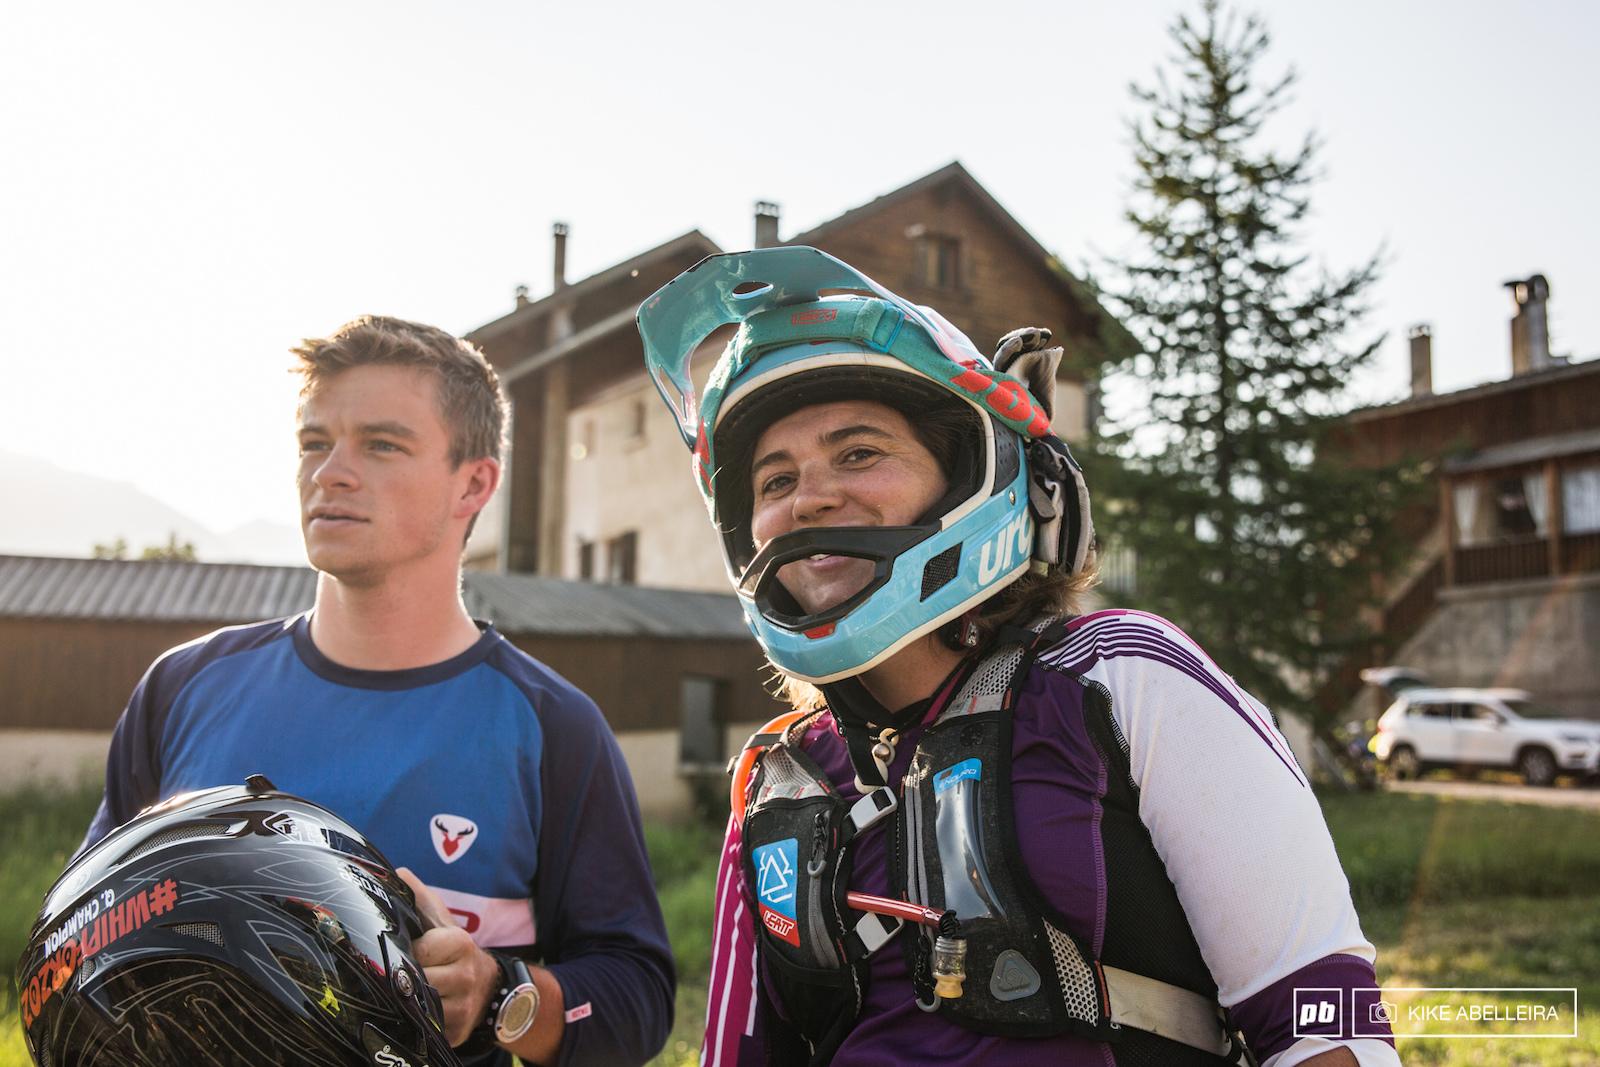 2017 French Enduro Series Round 3 Val d Allos